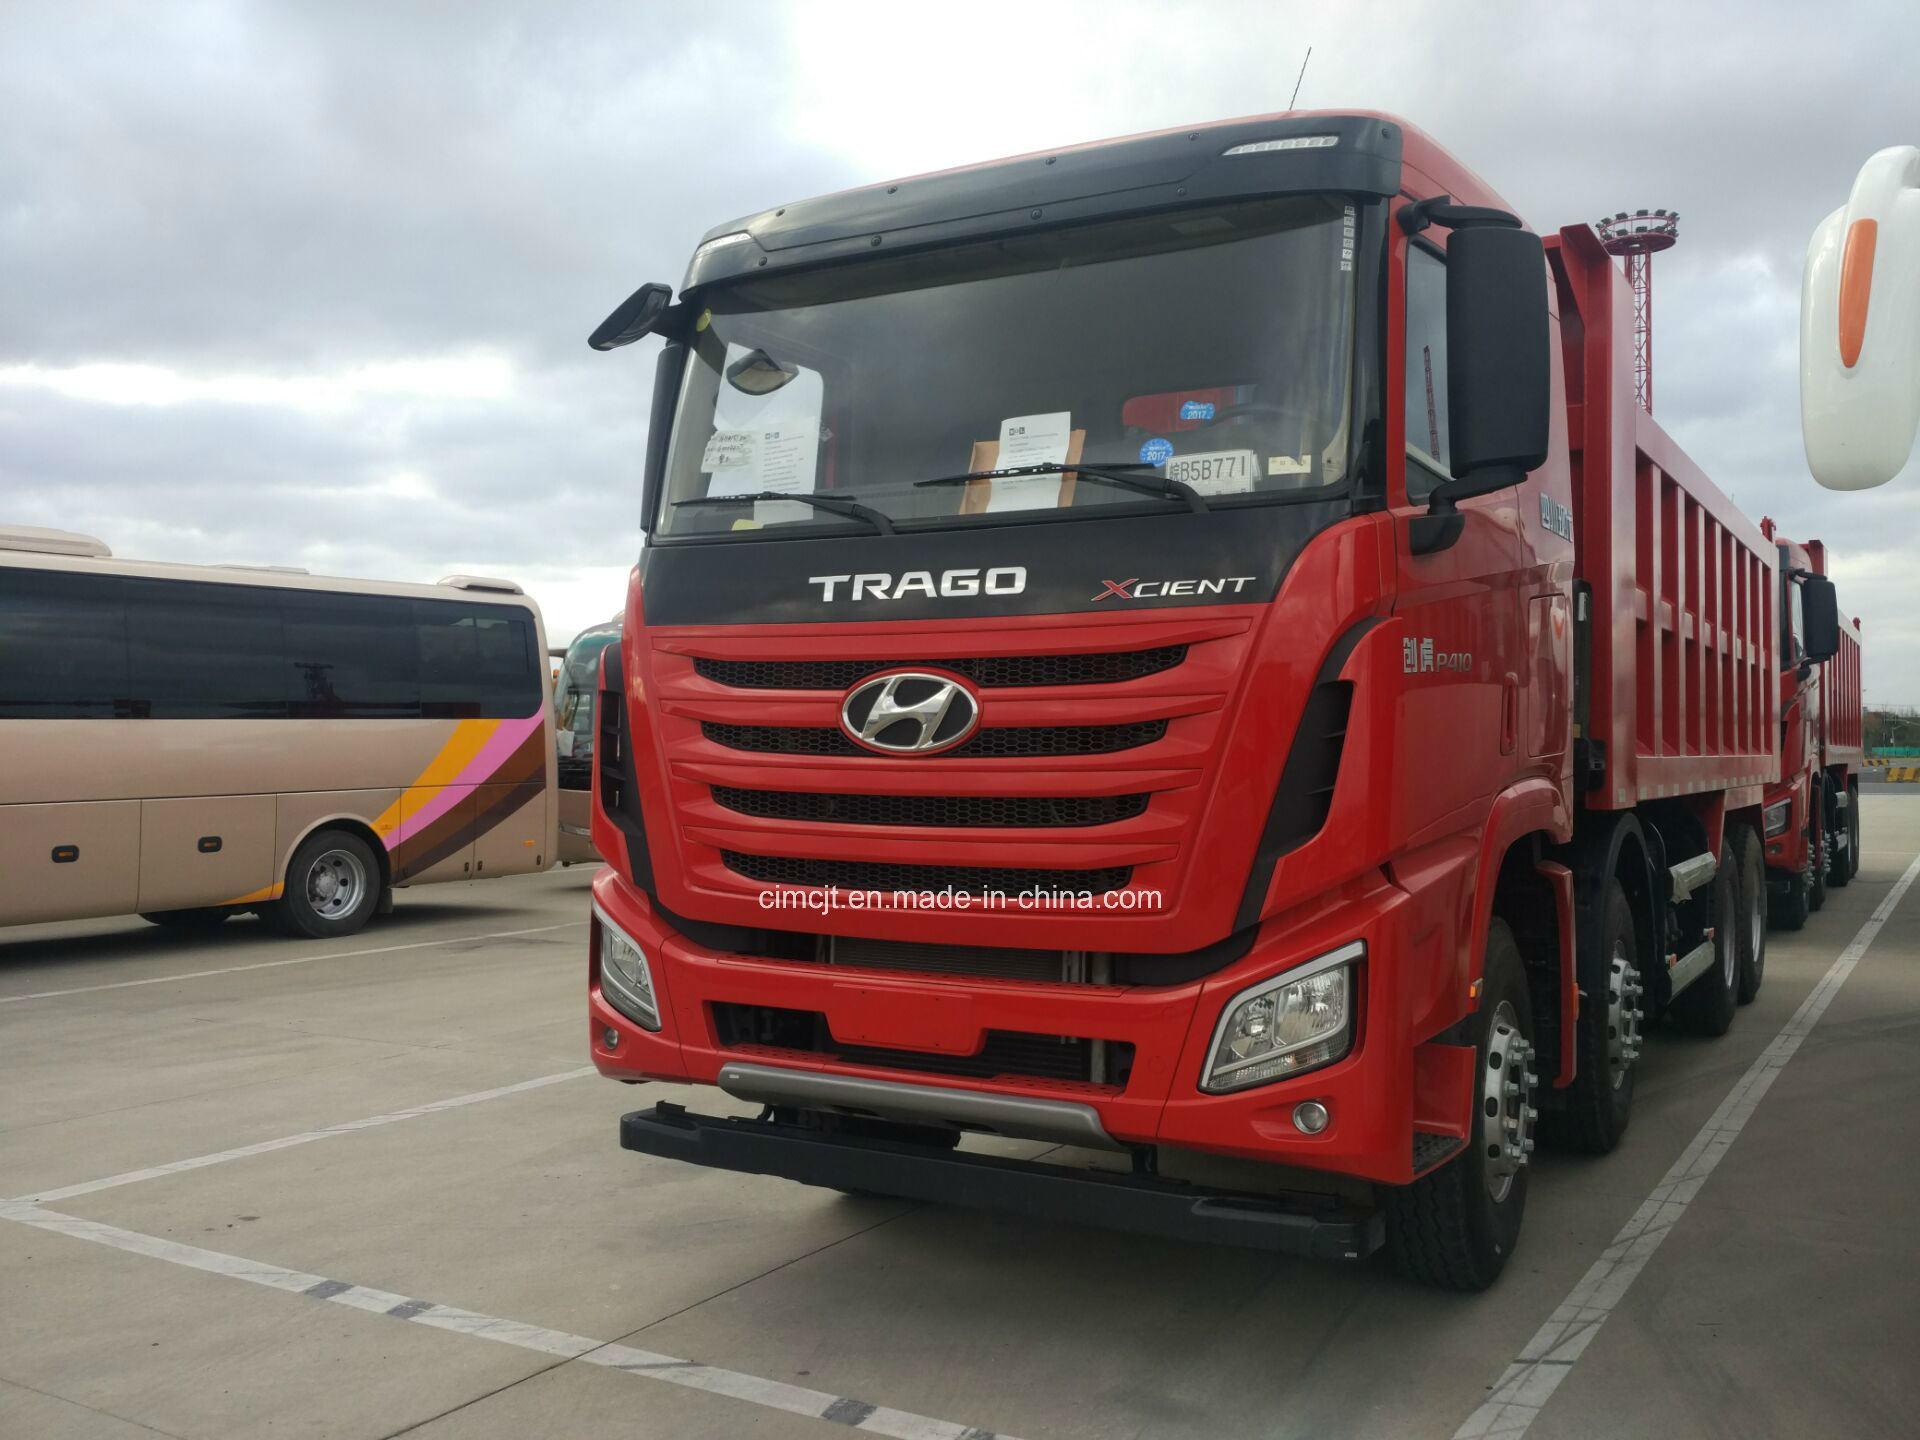 China New Hyundai Xcient 8x4 40 Ton Heavy Dumper Truck For Sale 1 8l Engine Dump Tipper